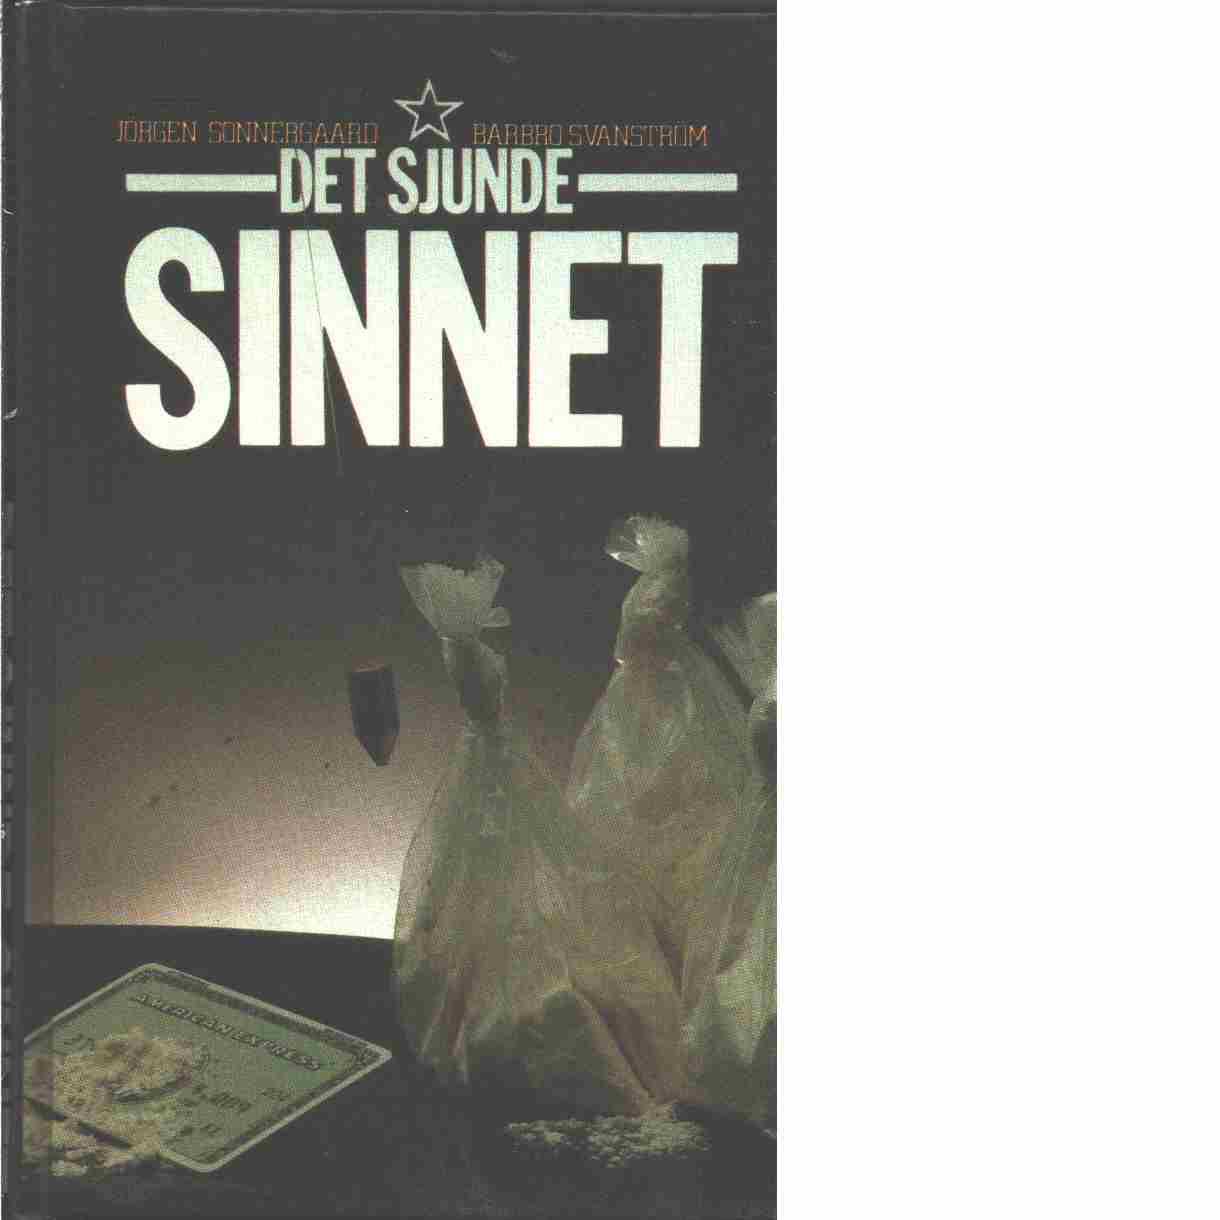 Det sjunde sinnet - Sonnergaard, Jørgen ochSvanström, Barbro